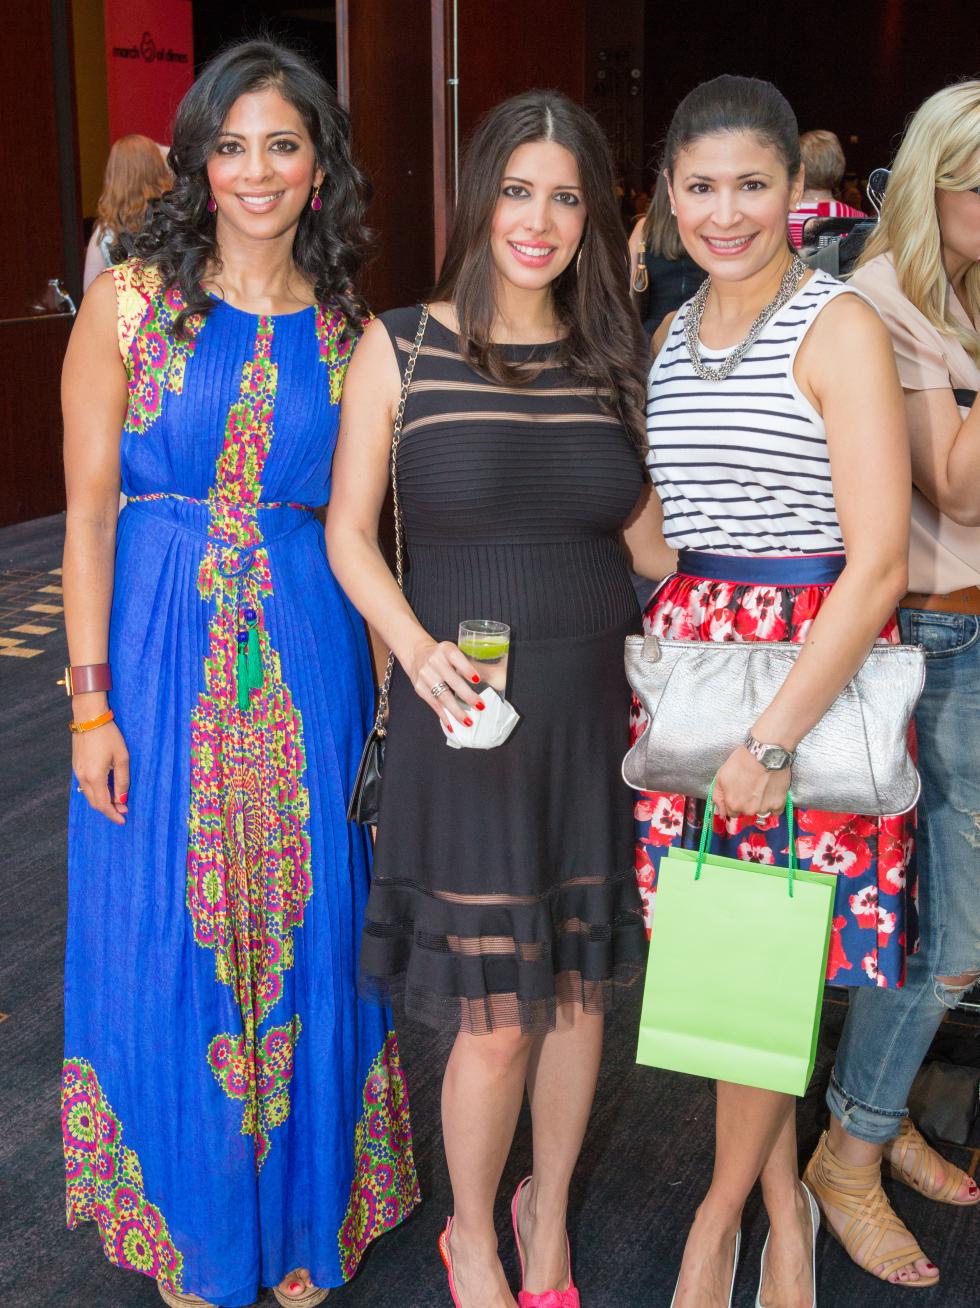 Houston, Woman's Hospital of Texas Labor Day Luncheon, August 2015, Elizabeth Abraham, Maria Lowery, Kristi Bradshaw